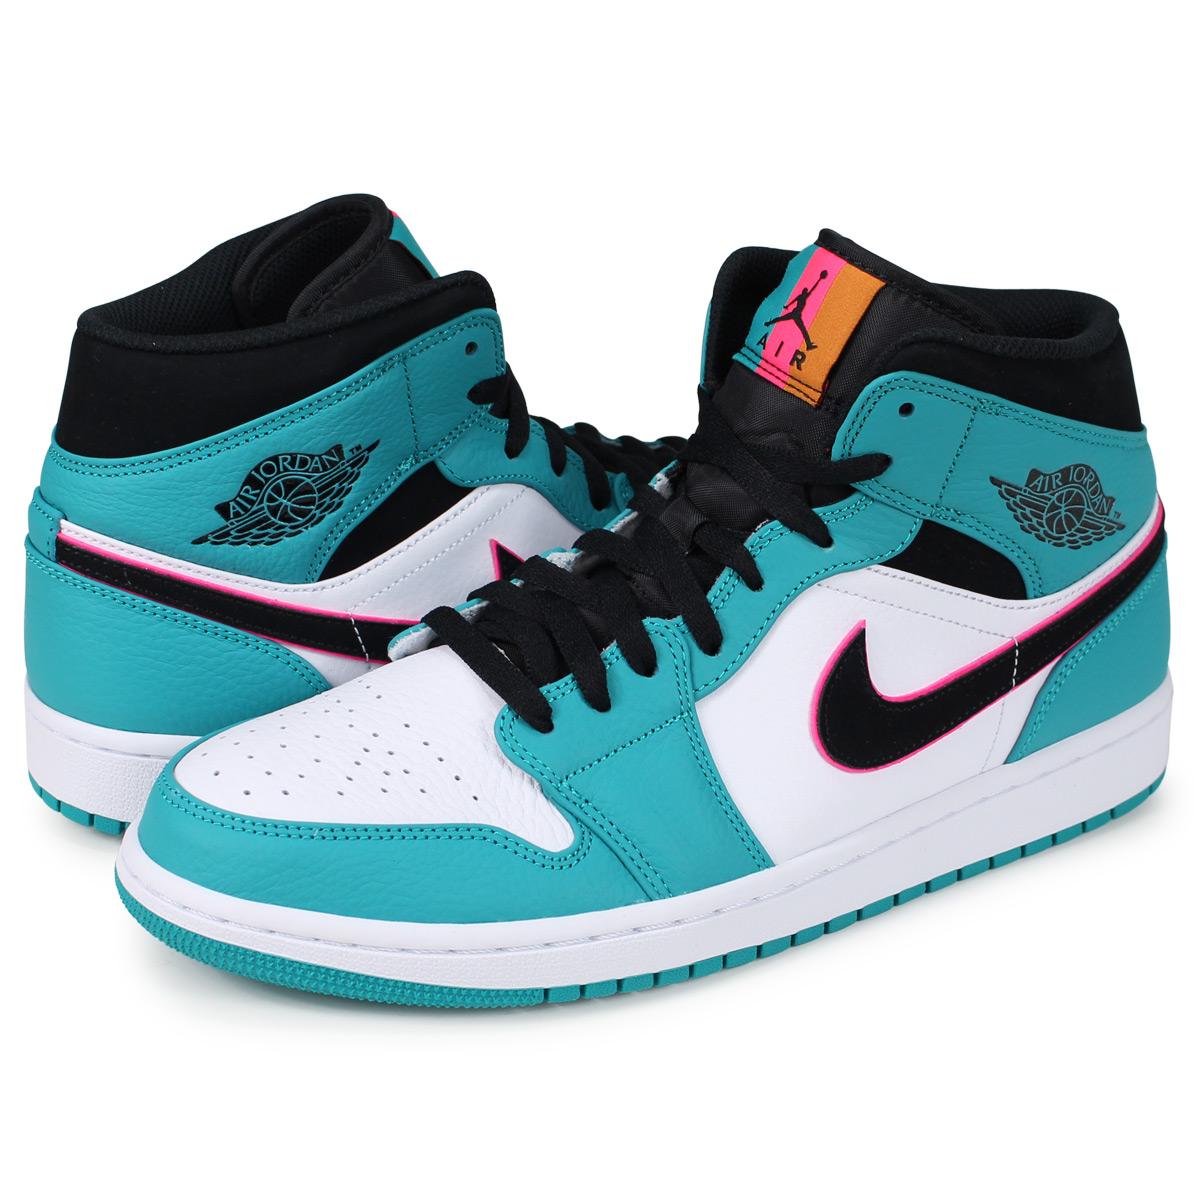 fa4e05e6f22 ALLSPORTS  Nike NIKE Air Jordan 1 sneakers men AIR JORDAN 1 MID SE ...